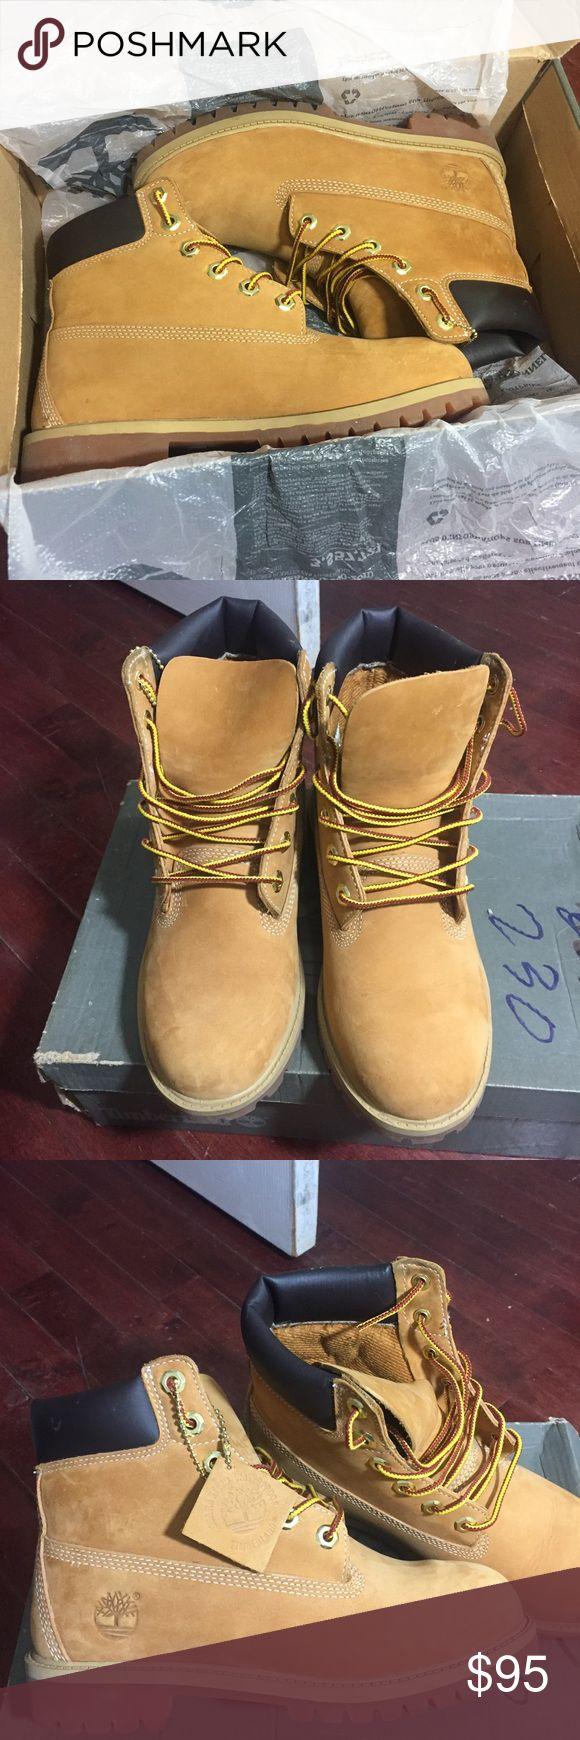 Wheat Timberland Boots Worn a few times  Like new size 4.5 kids Timberland Shoes Winter & Rain Boots